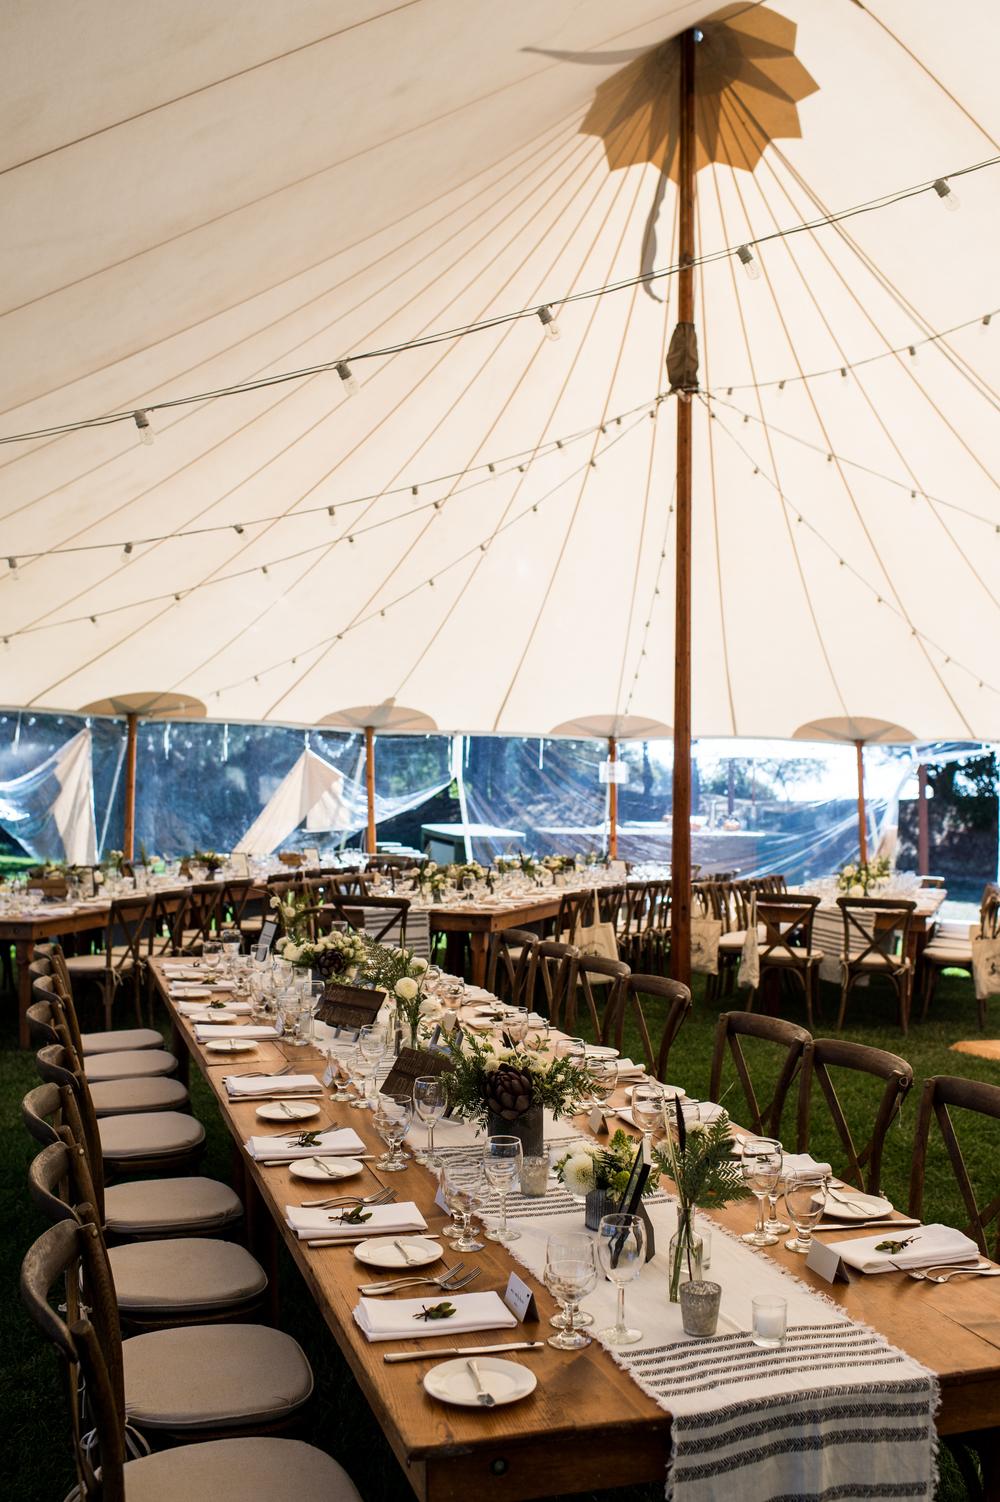 PHOTO: Theilen Photography   PAPER: Paper Caper   FLORAL:  Erica Rose Design   LINEN:  LaTavola Linen   RENTAL:  Zephyr Tents   VENUE: Costanoa Lodge